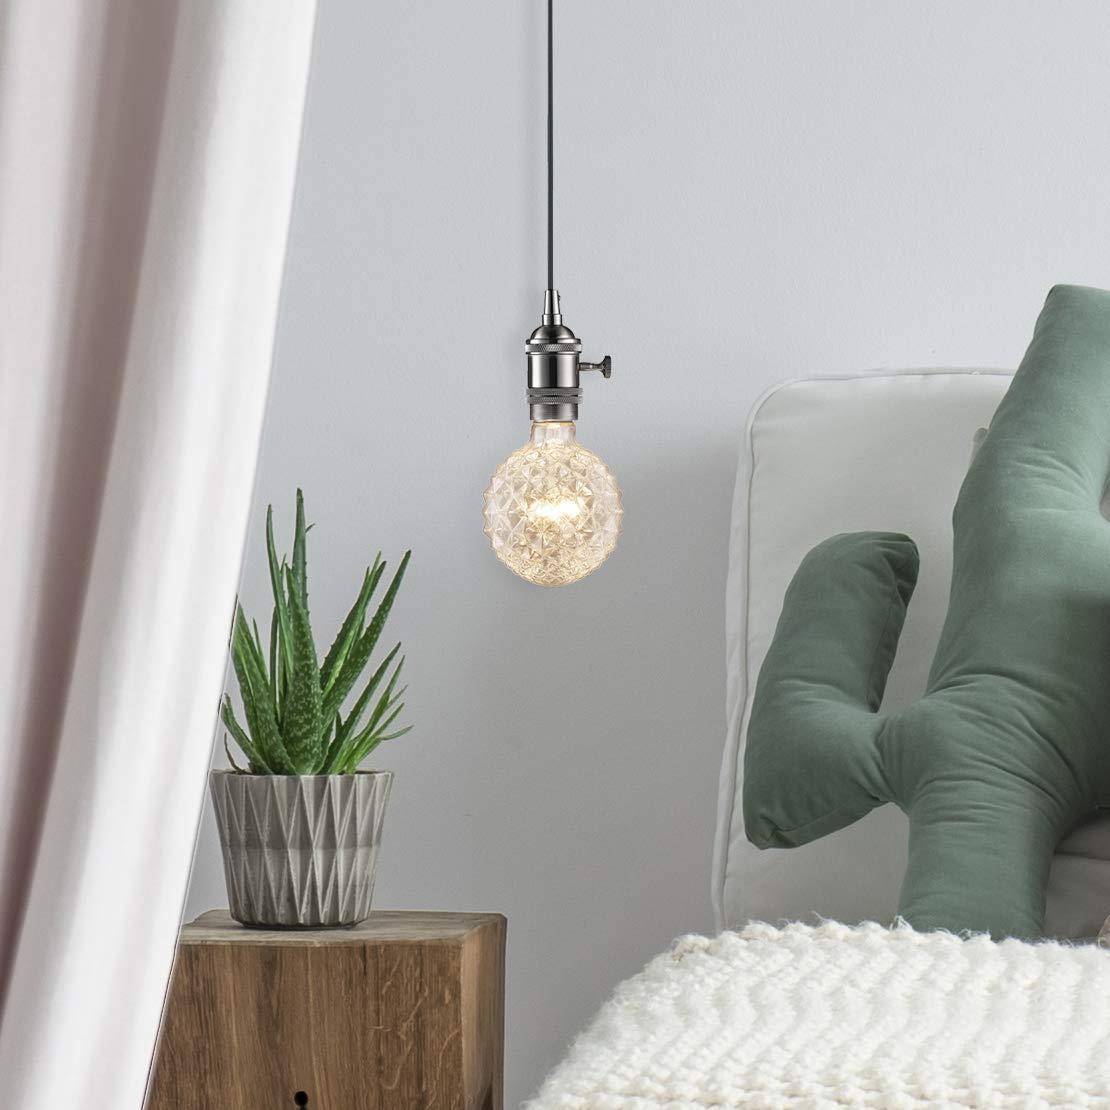 Globe Electric Company 84637 Crystal Designer Bulb